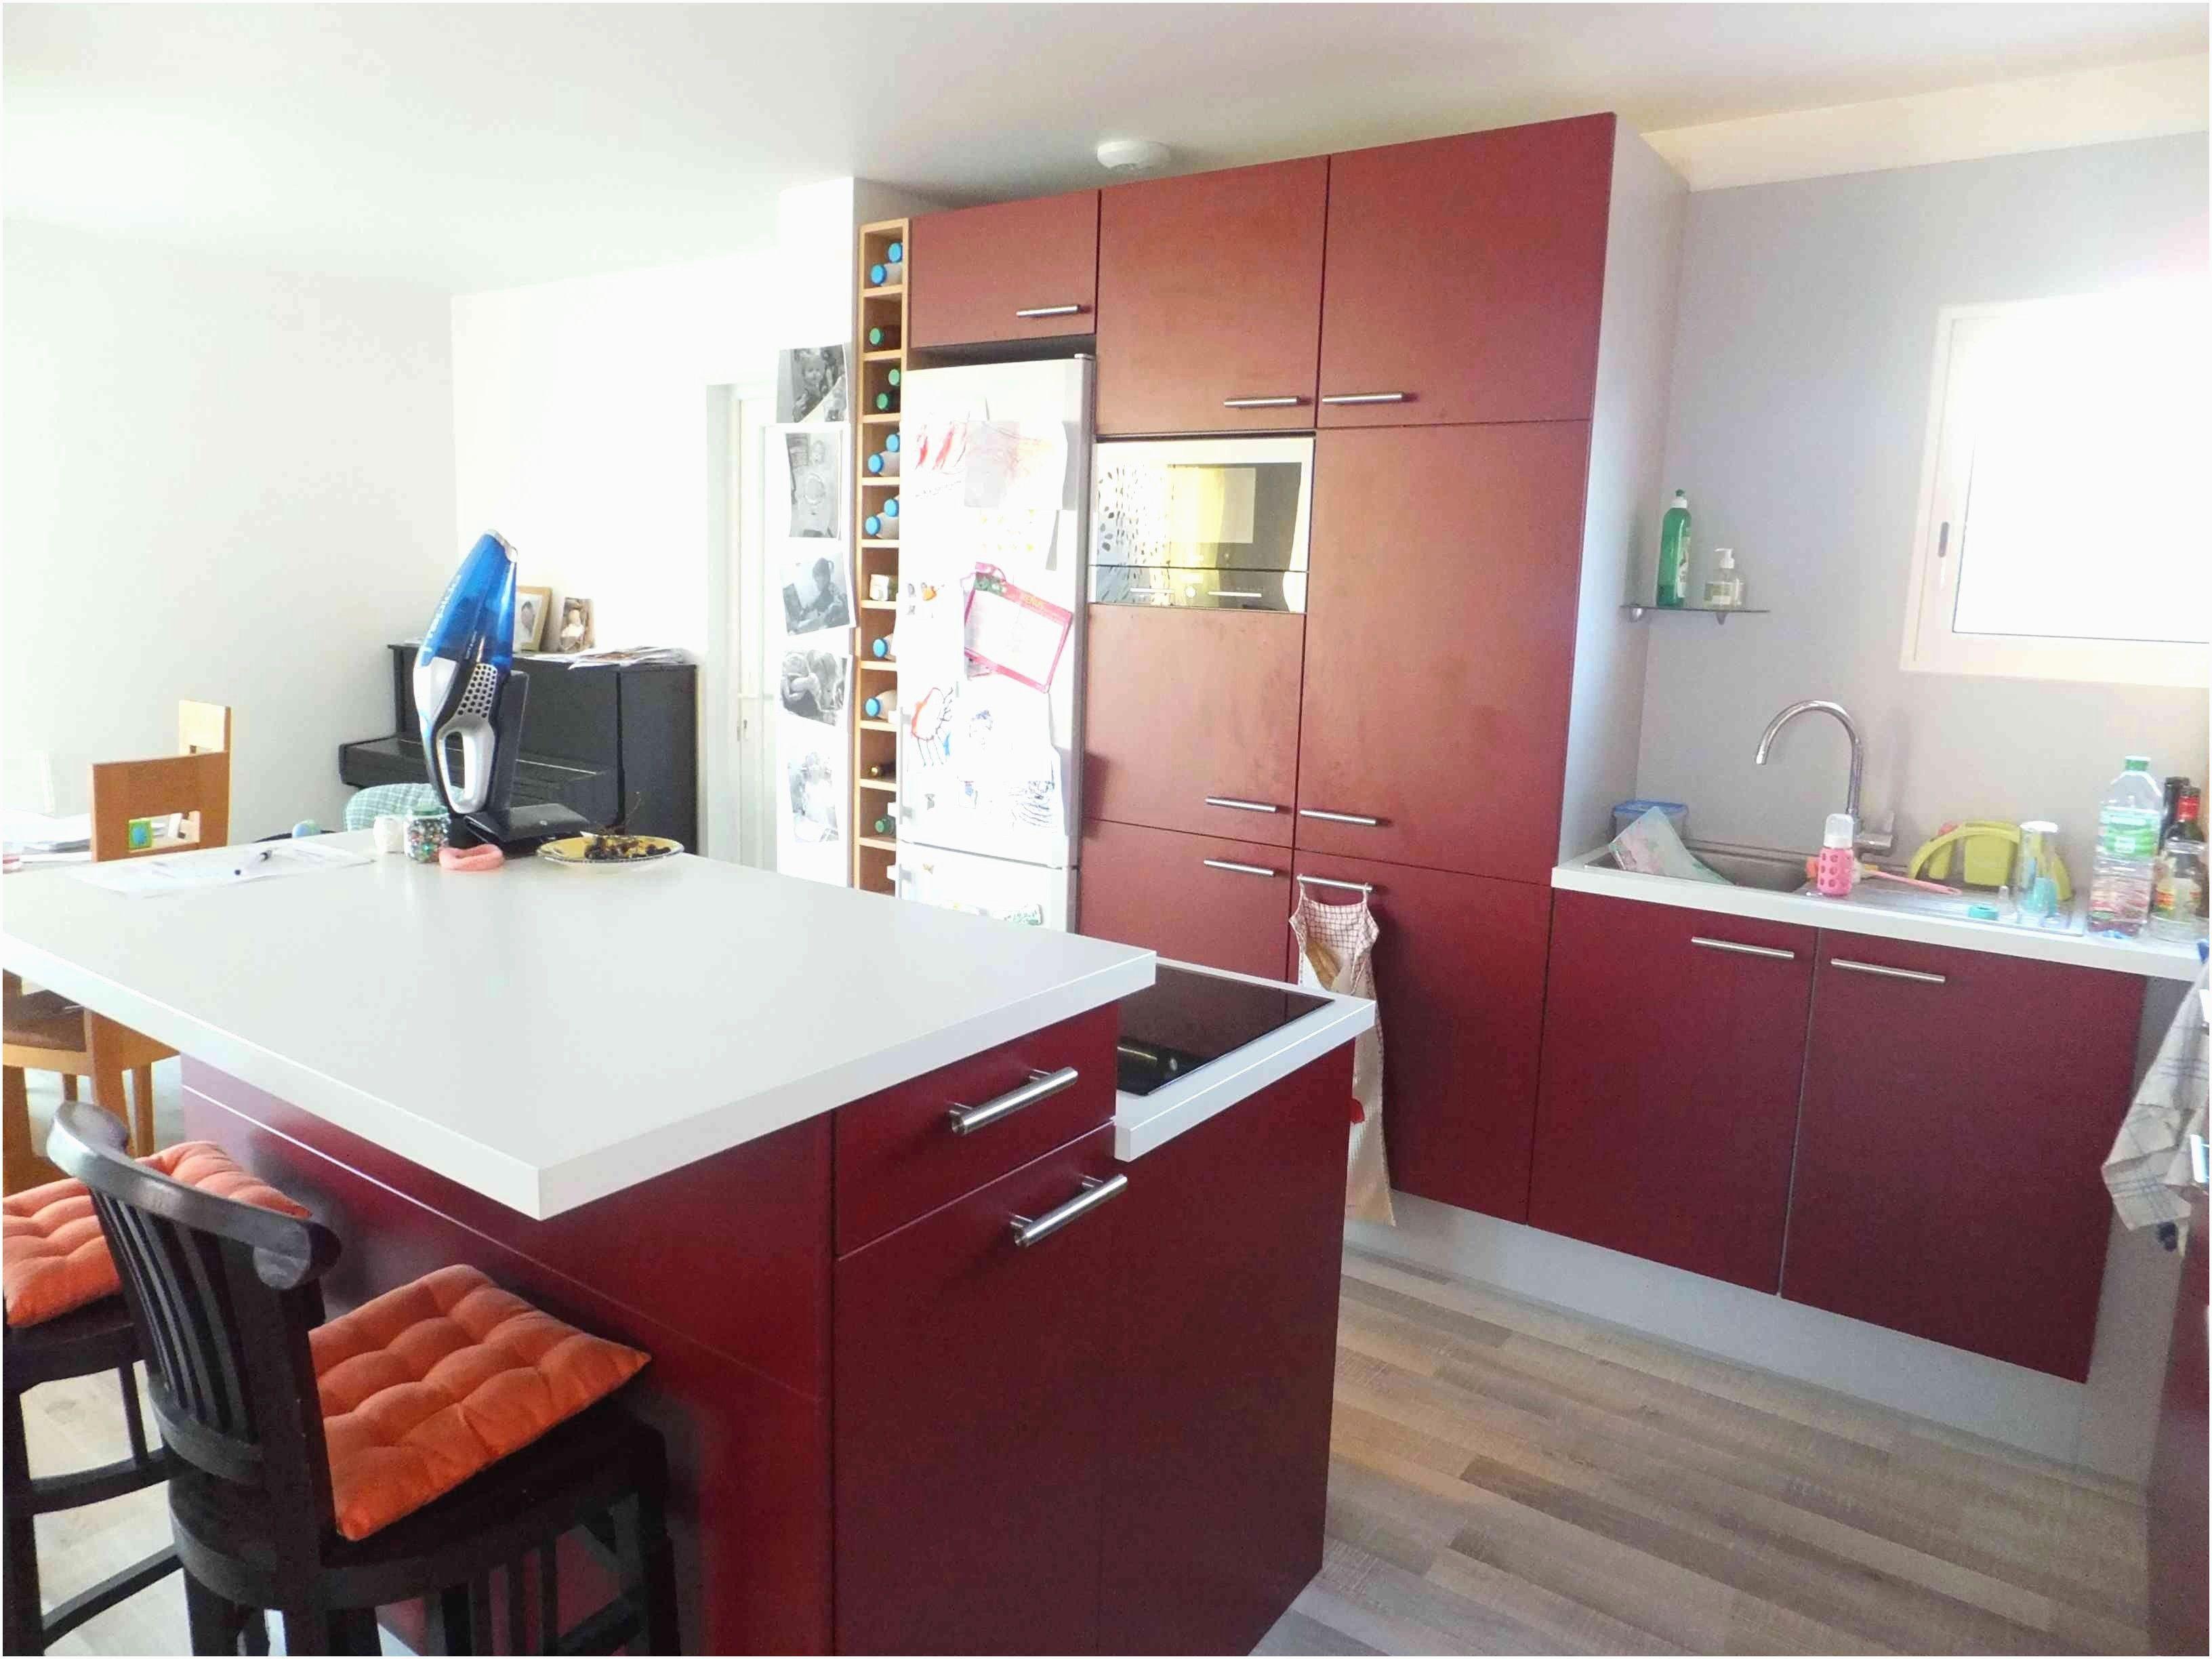 Etagere Salle De Bain Castorama Lino Pas Cher Bricorama Kitchen Remodel Cuisine Ikea Home Decor